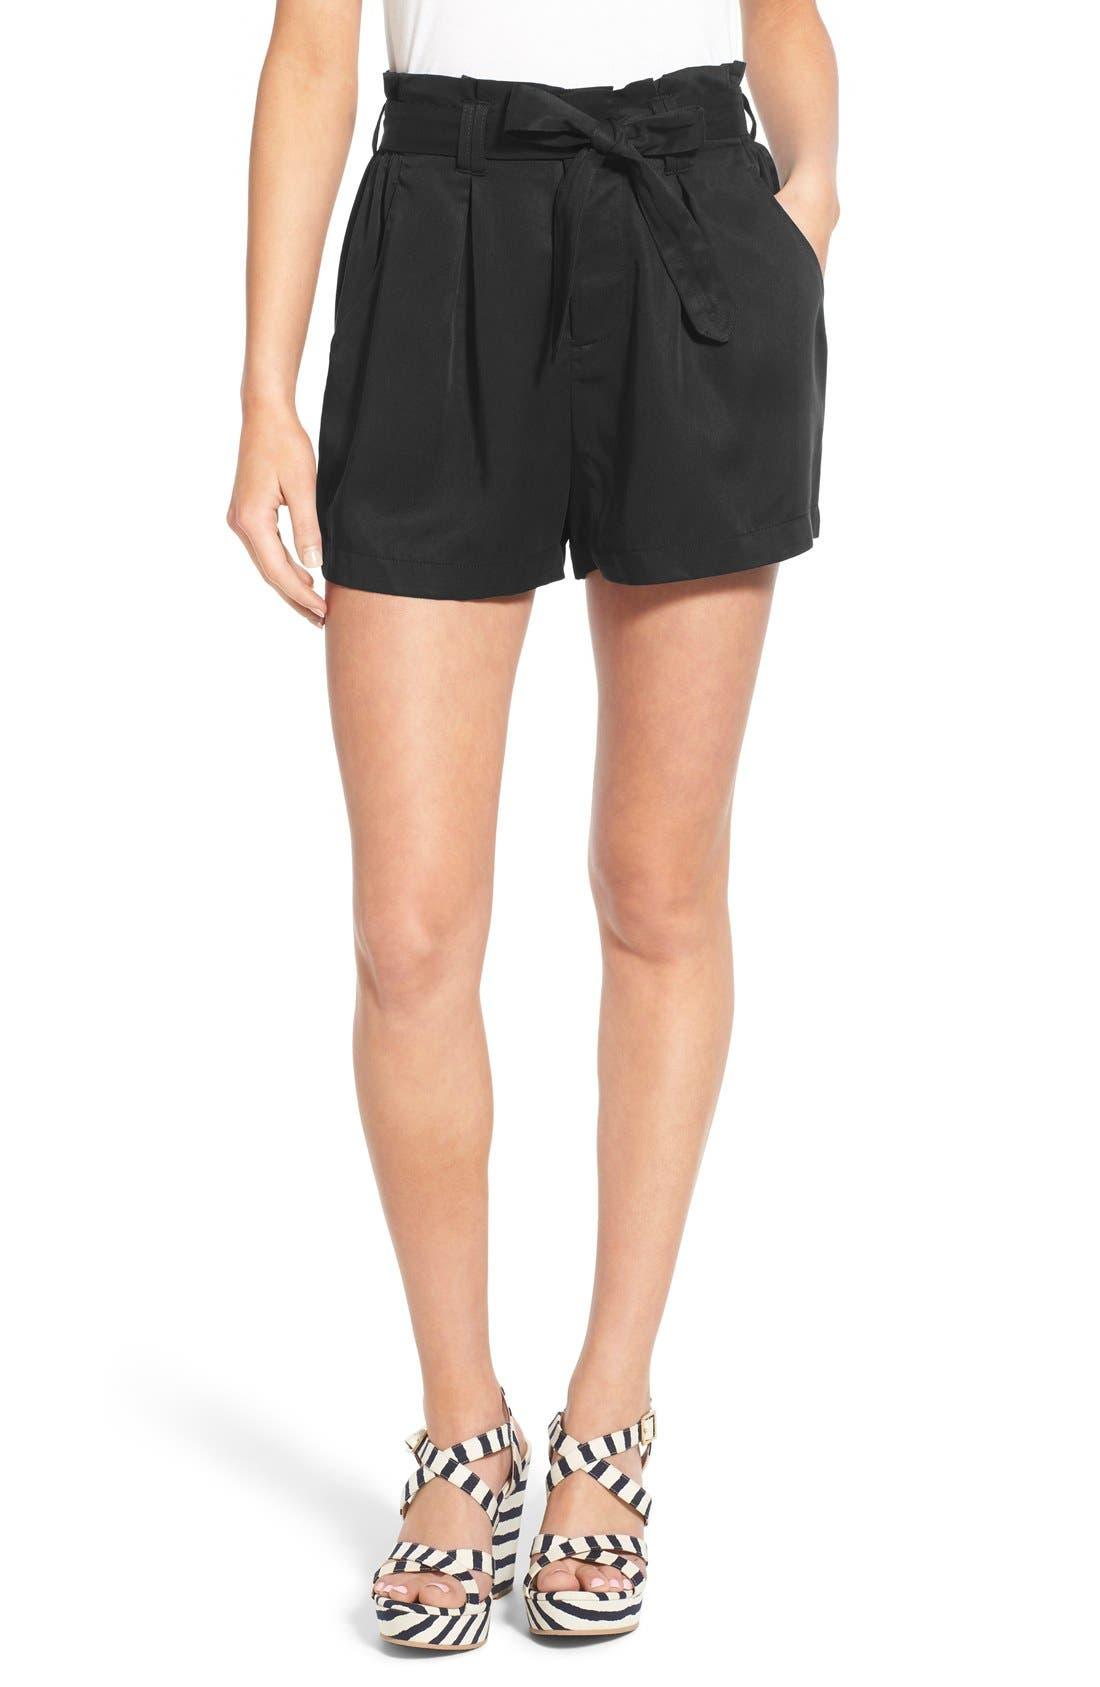 CHLOE & KATIE Paperbag Shorts, Main, color, 001